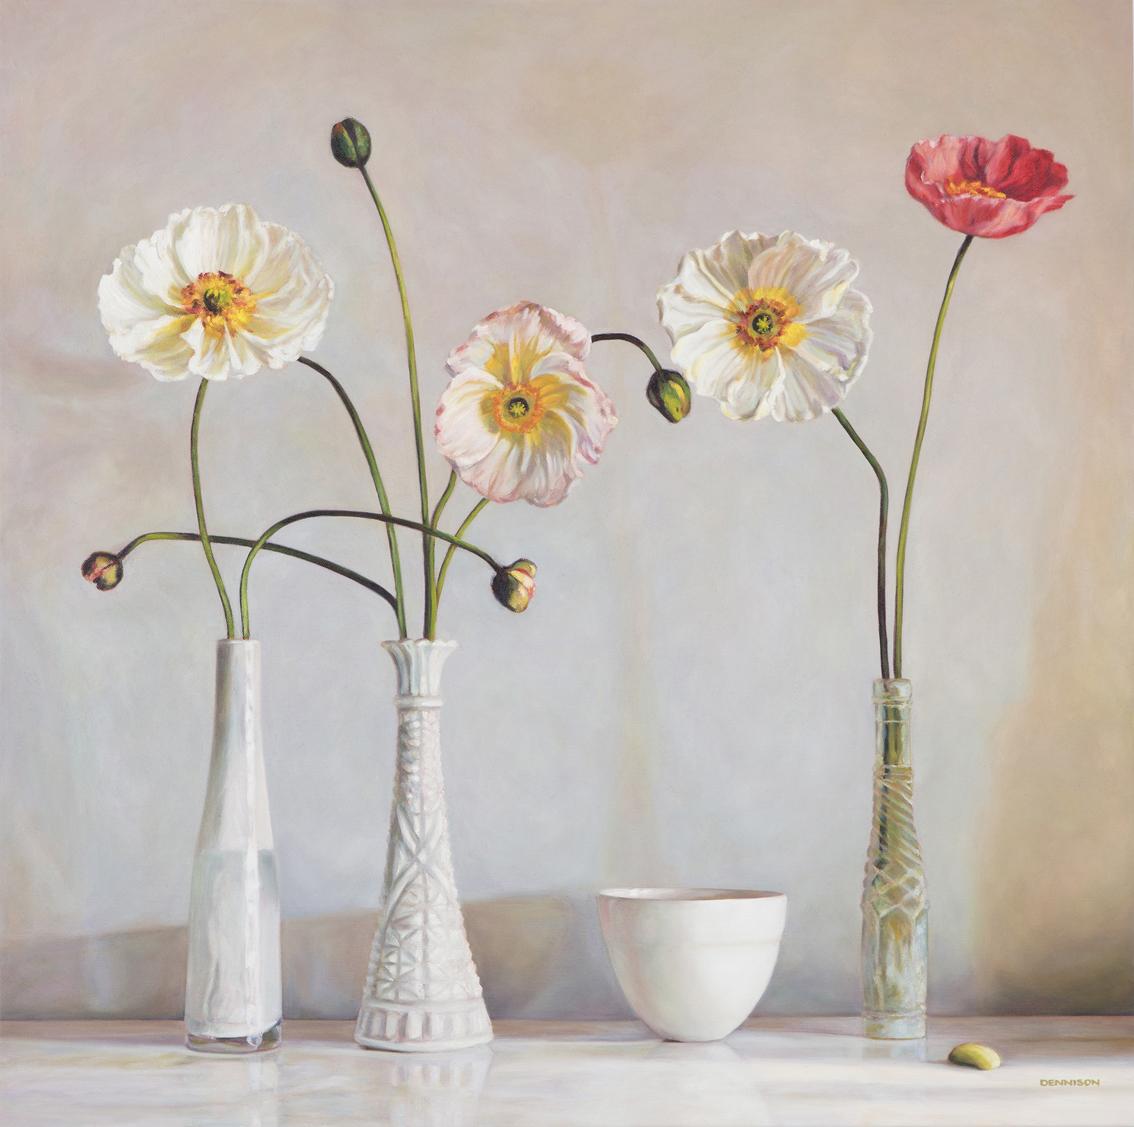 Interlacing Poppies   Oil on Canvas, 84cm x 84cm